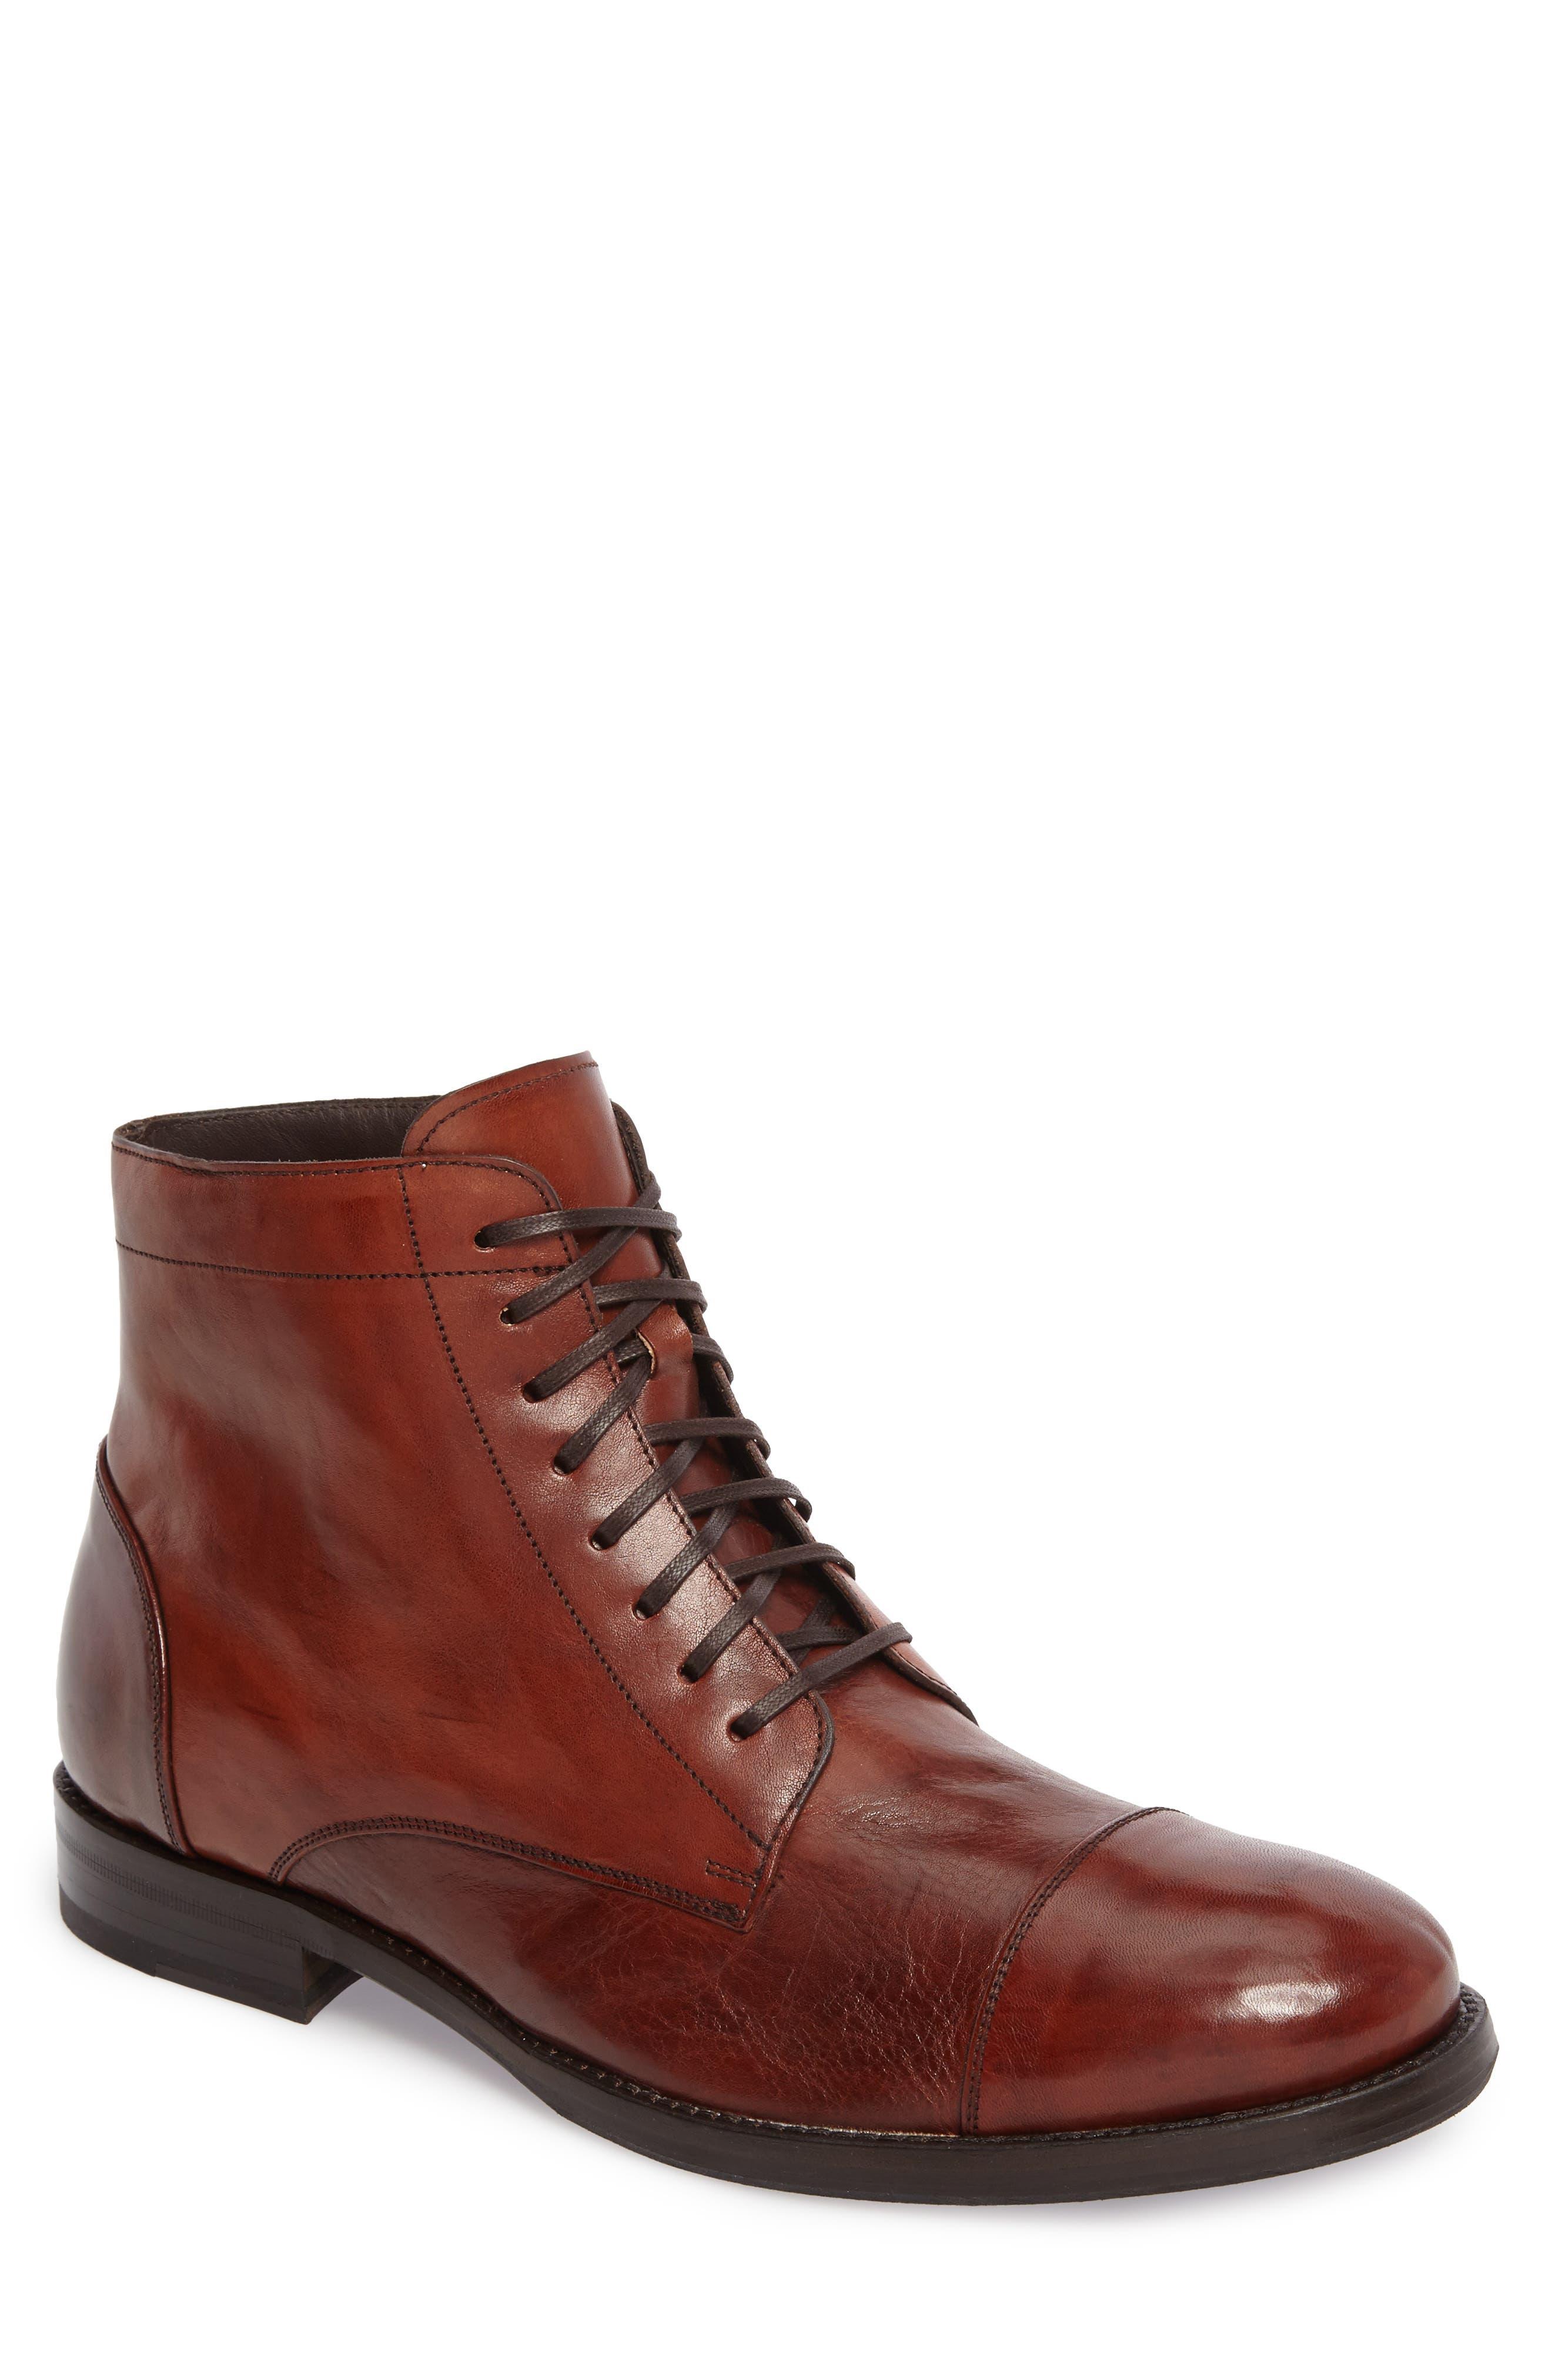 Alternate Image 1 Selected - Maison Forte Murcie Cap Toe Boot (Men)